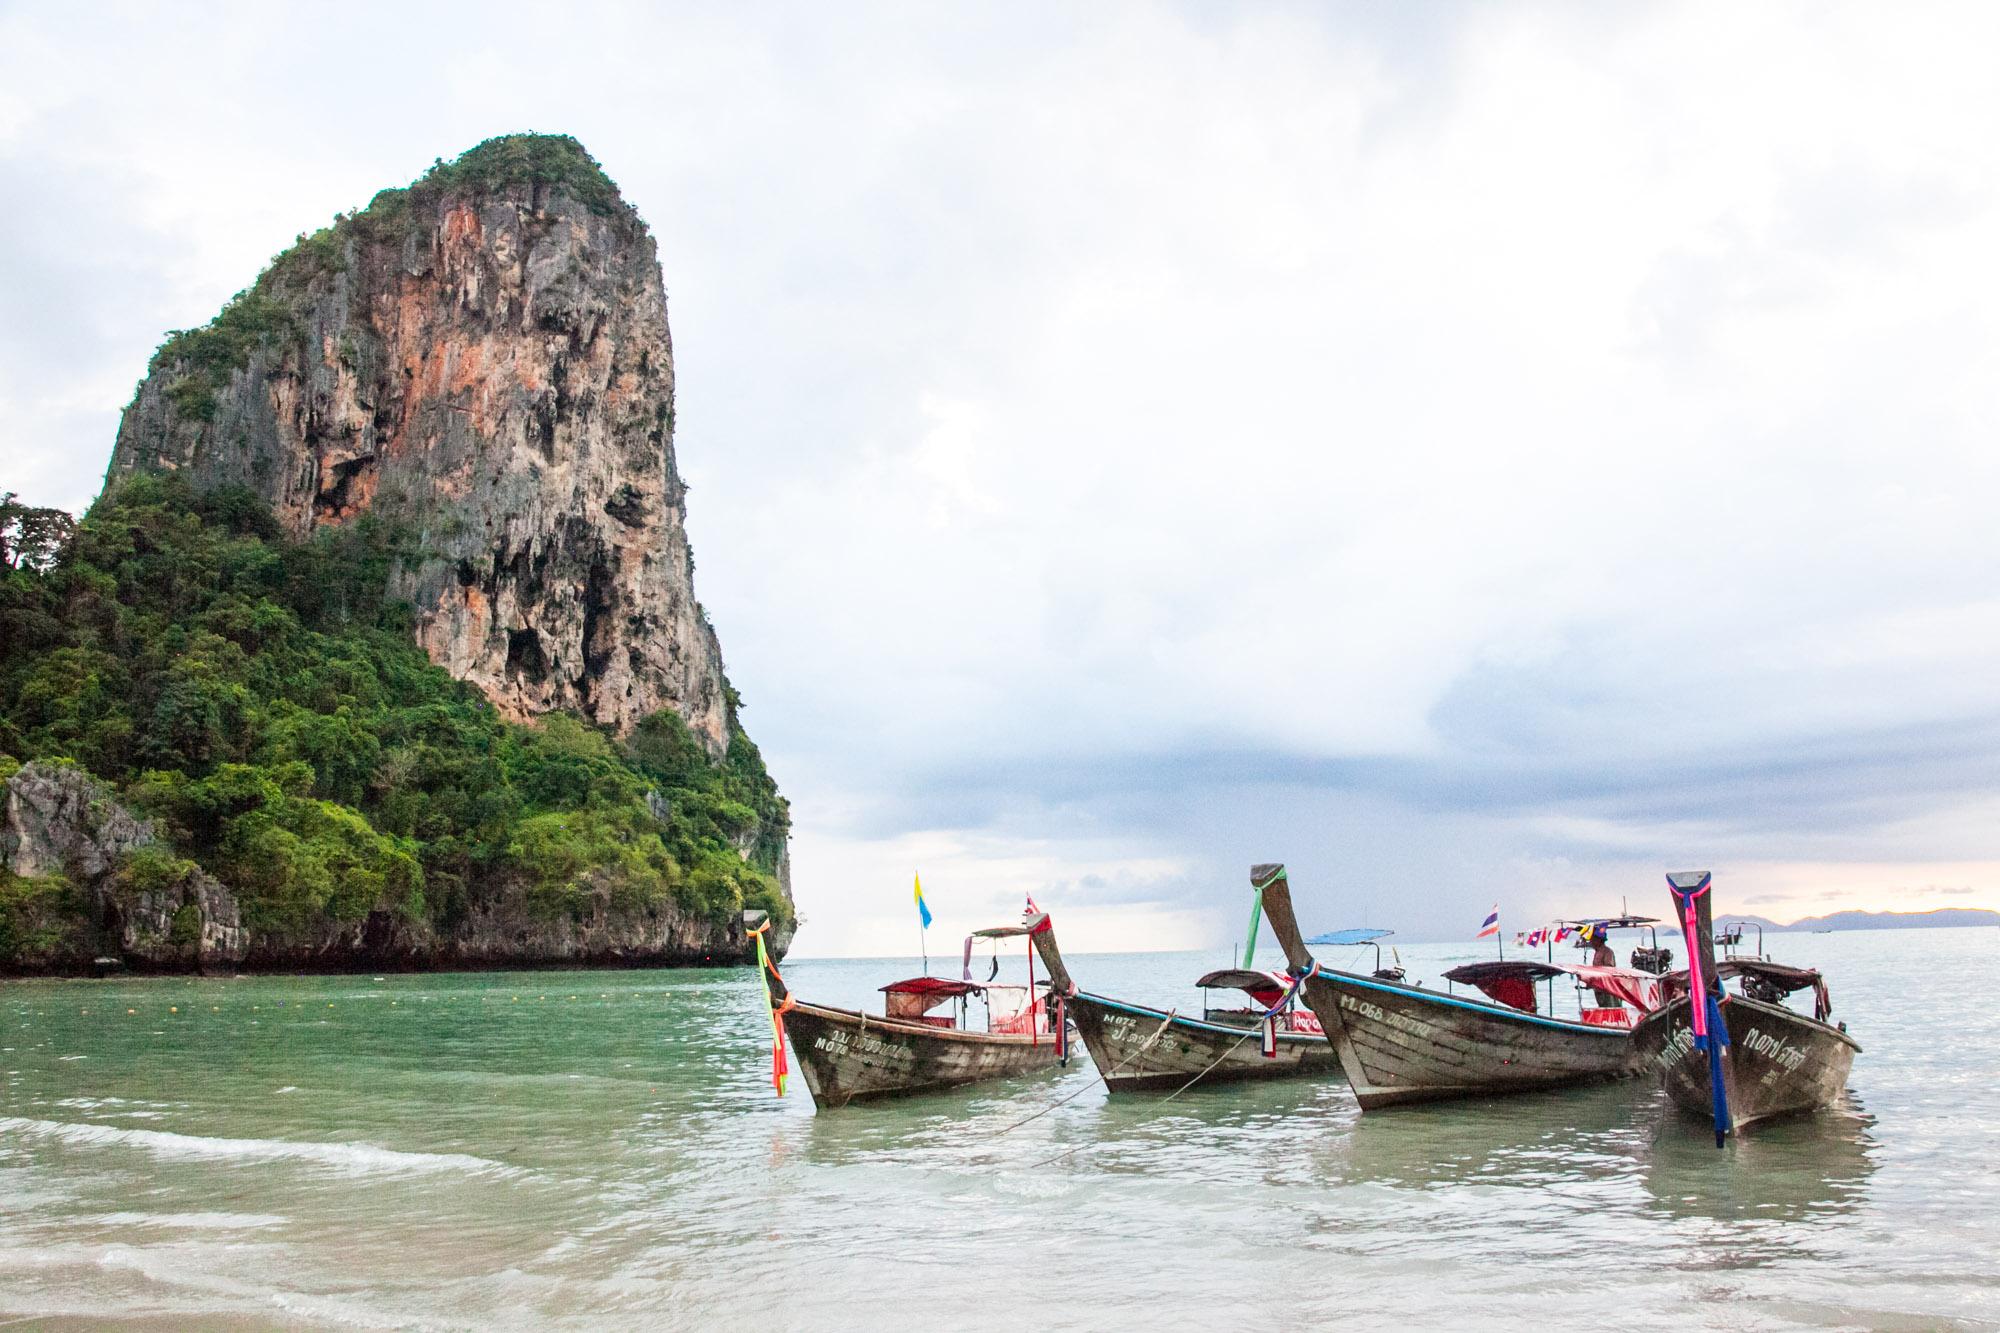 IMG_3629-railay-beach-thailand-traveling-trisa-taro.jpg